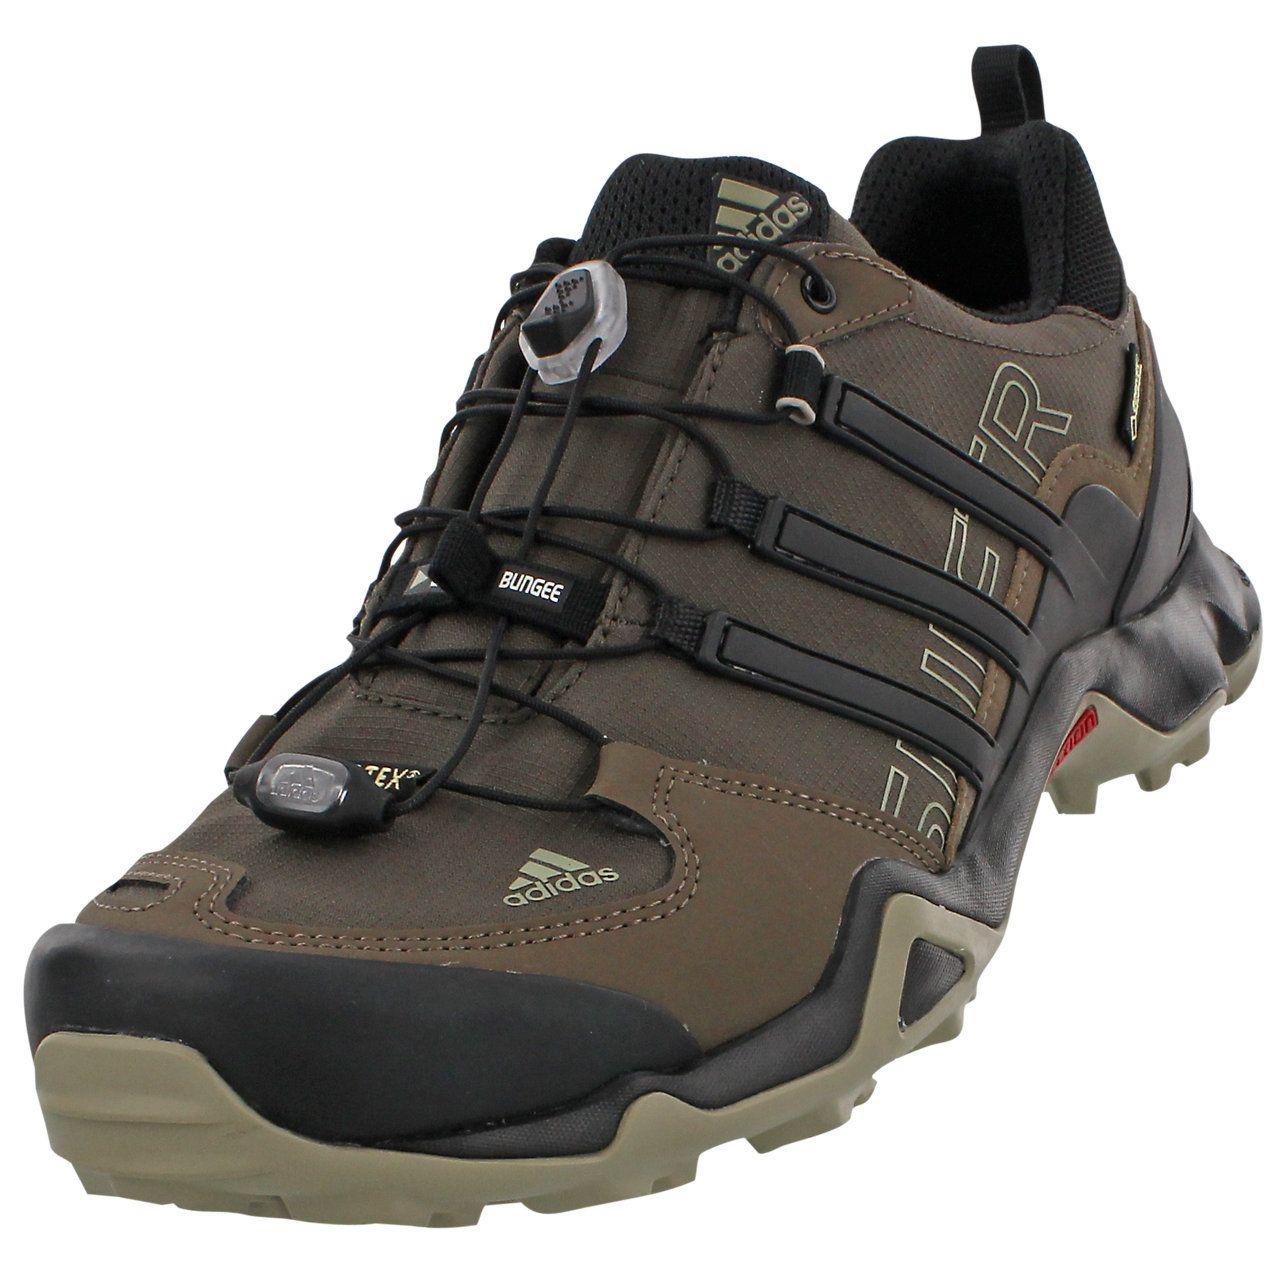 Adidas Aq5307 Men S Terrex Swift R Gtx Shoes Tactical Shoes Hiking Boots Boots